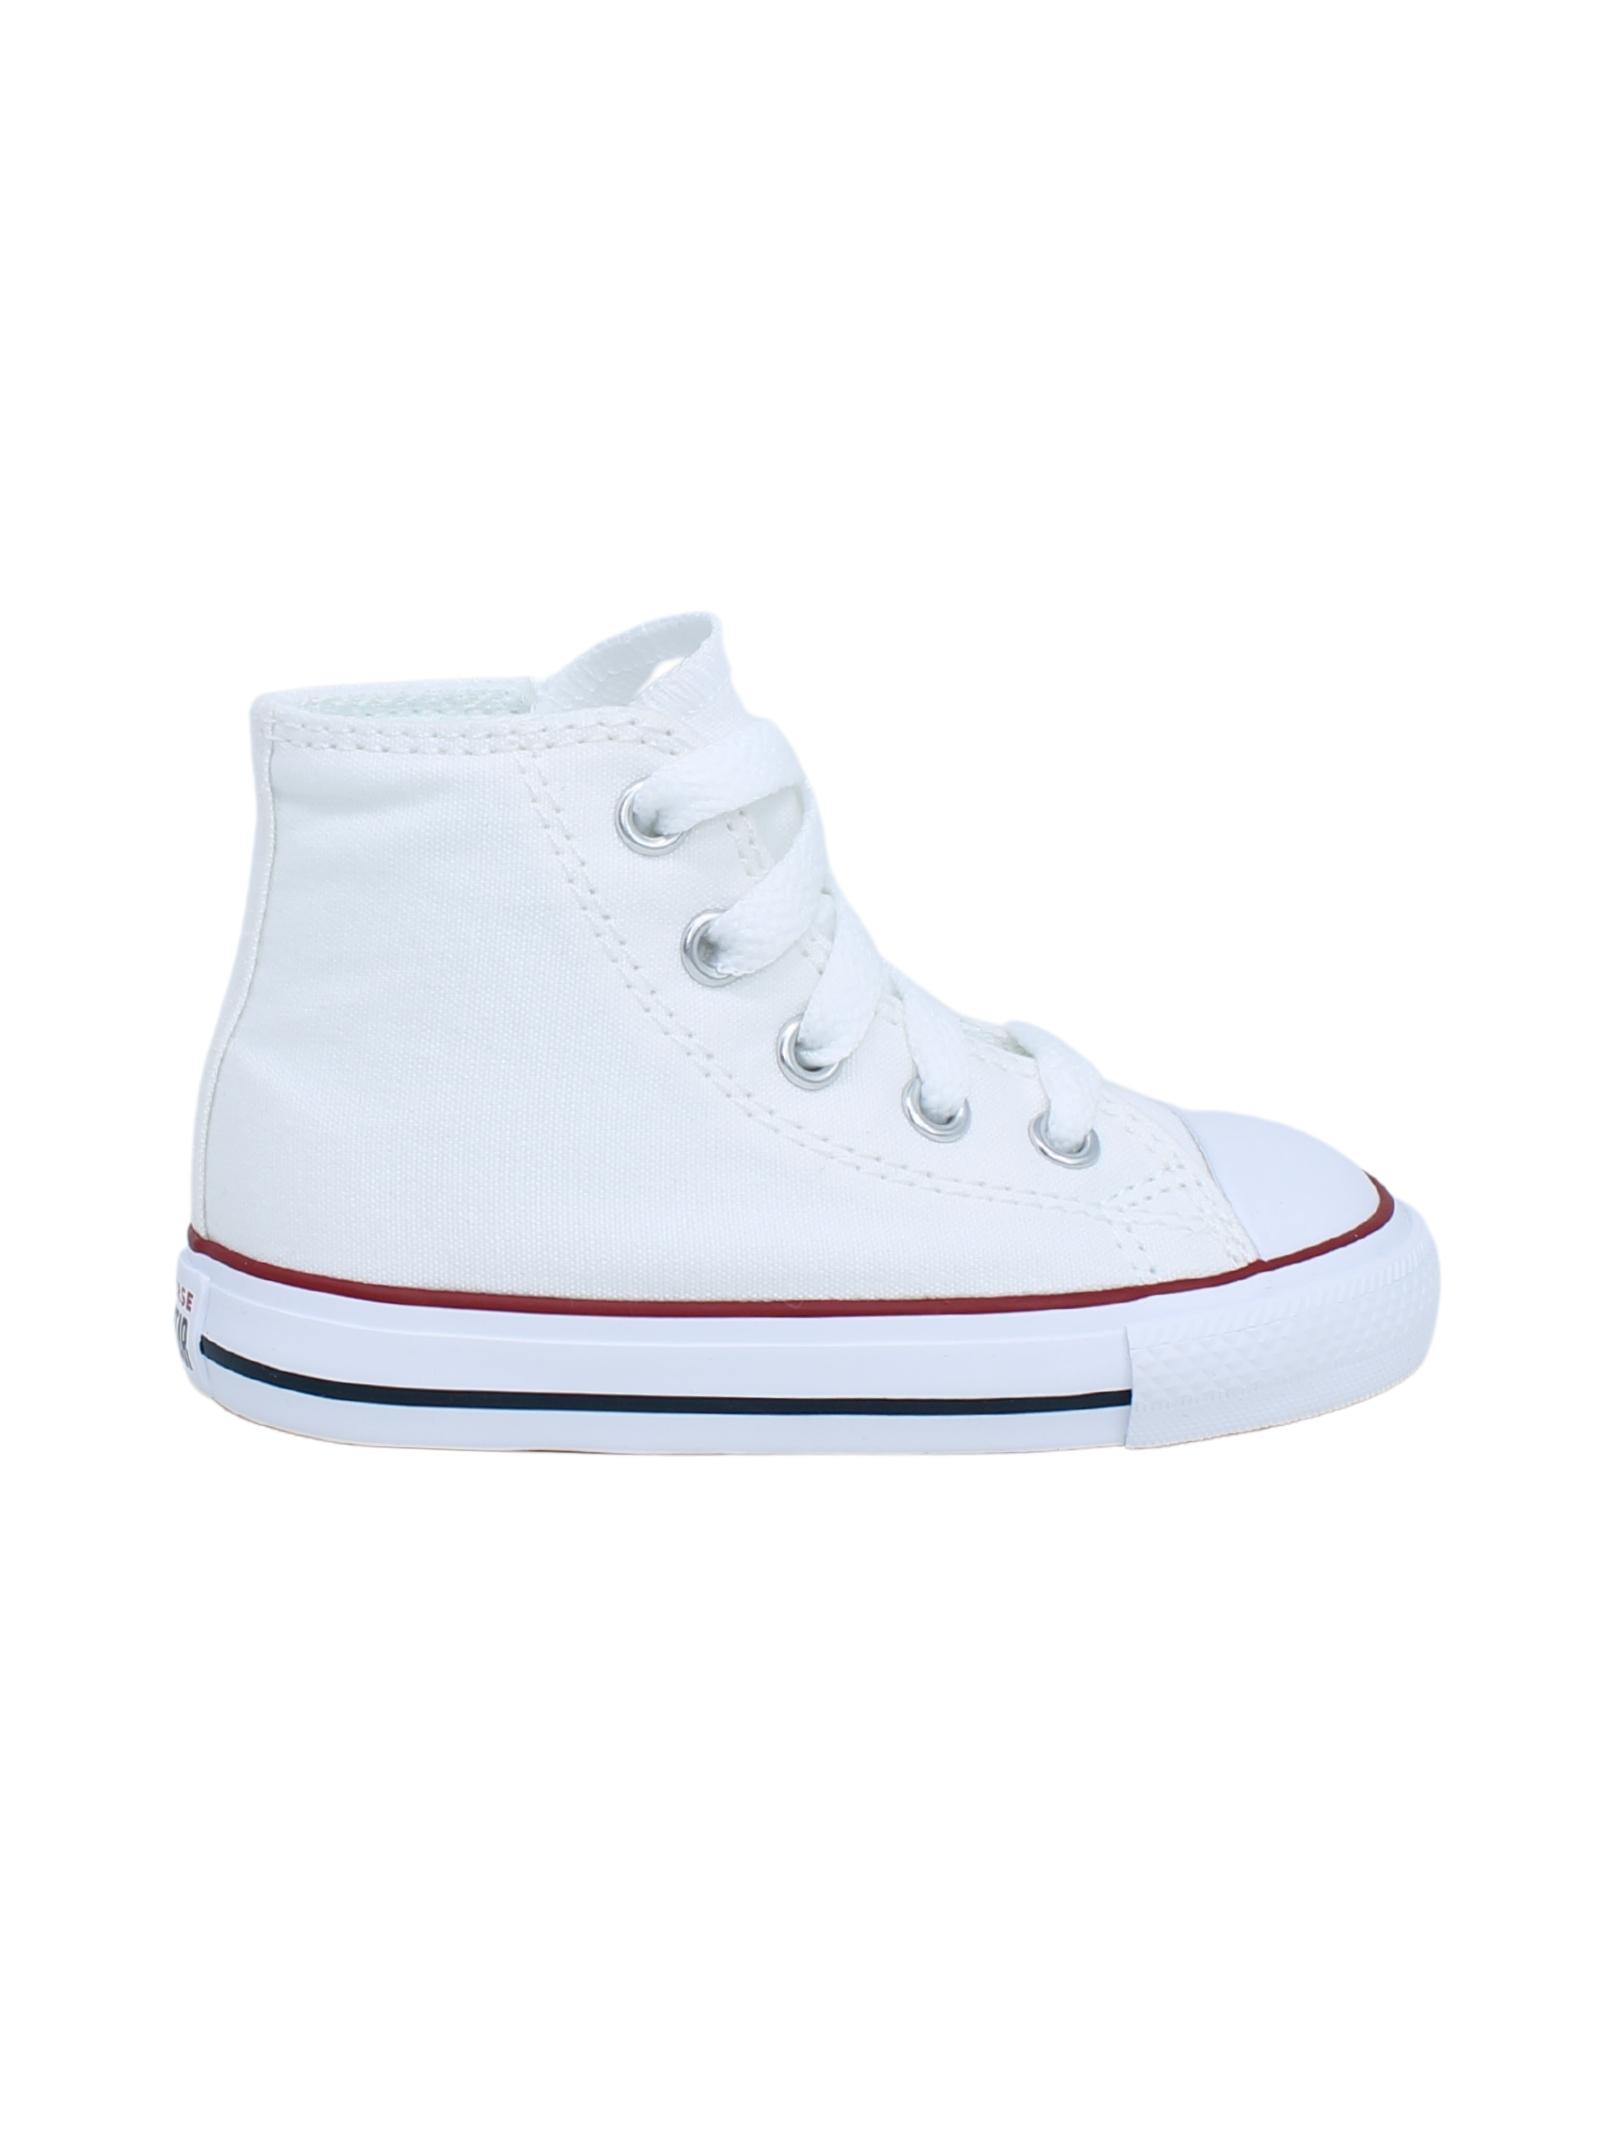 Converse Bambino White CONVERSE KIDS | Sneakers | 7J253CBIANCO